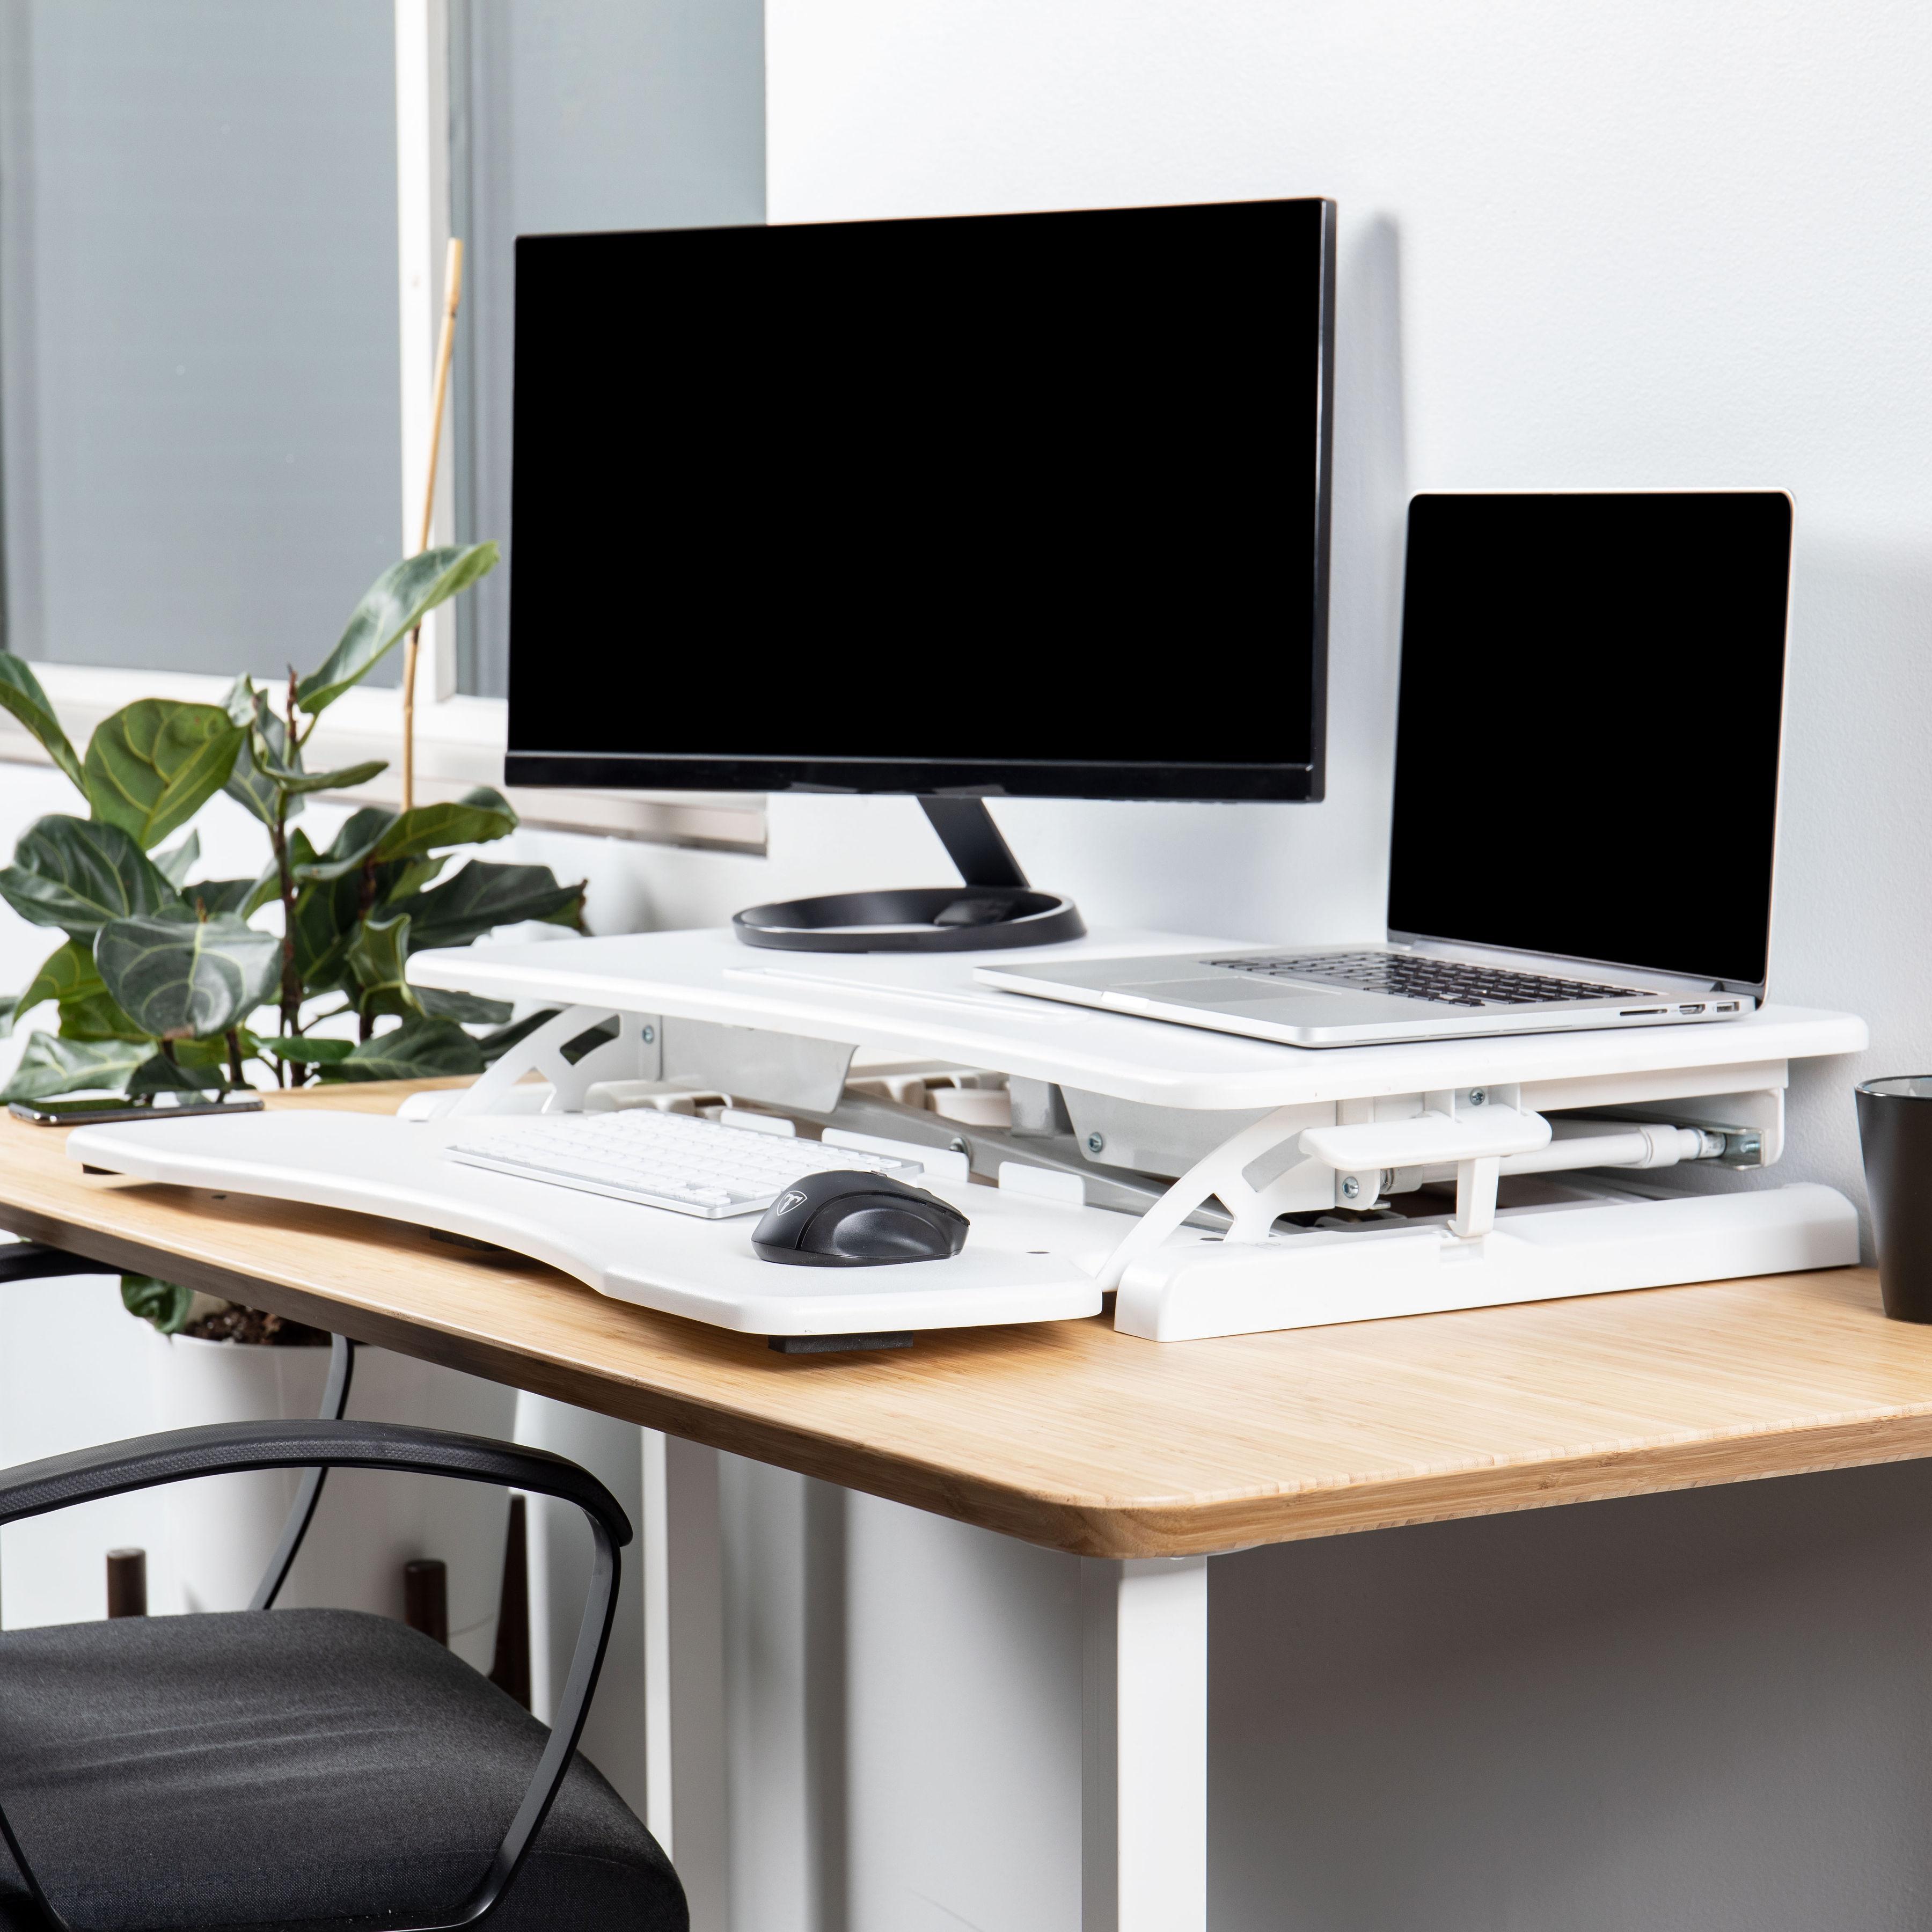 Rise-X-Light-Standing-Desk-Stand-Up-Desk-Height-Adjustable-Desk-Converter thumbnail 18